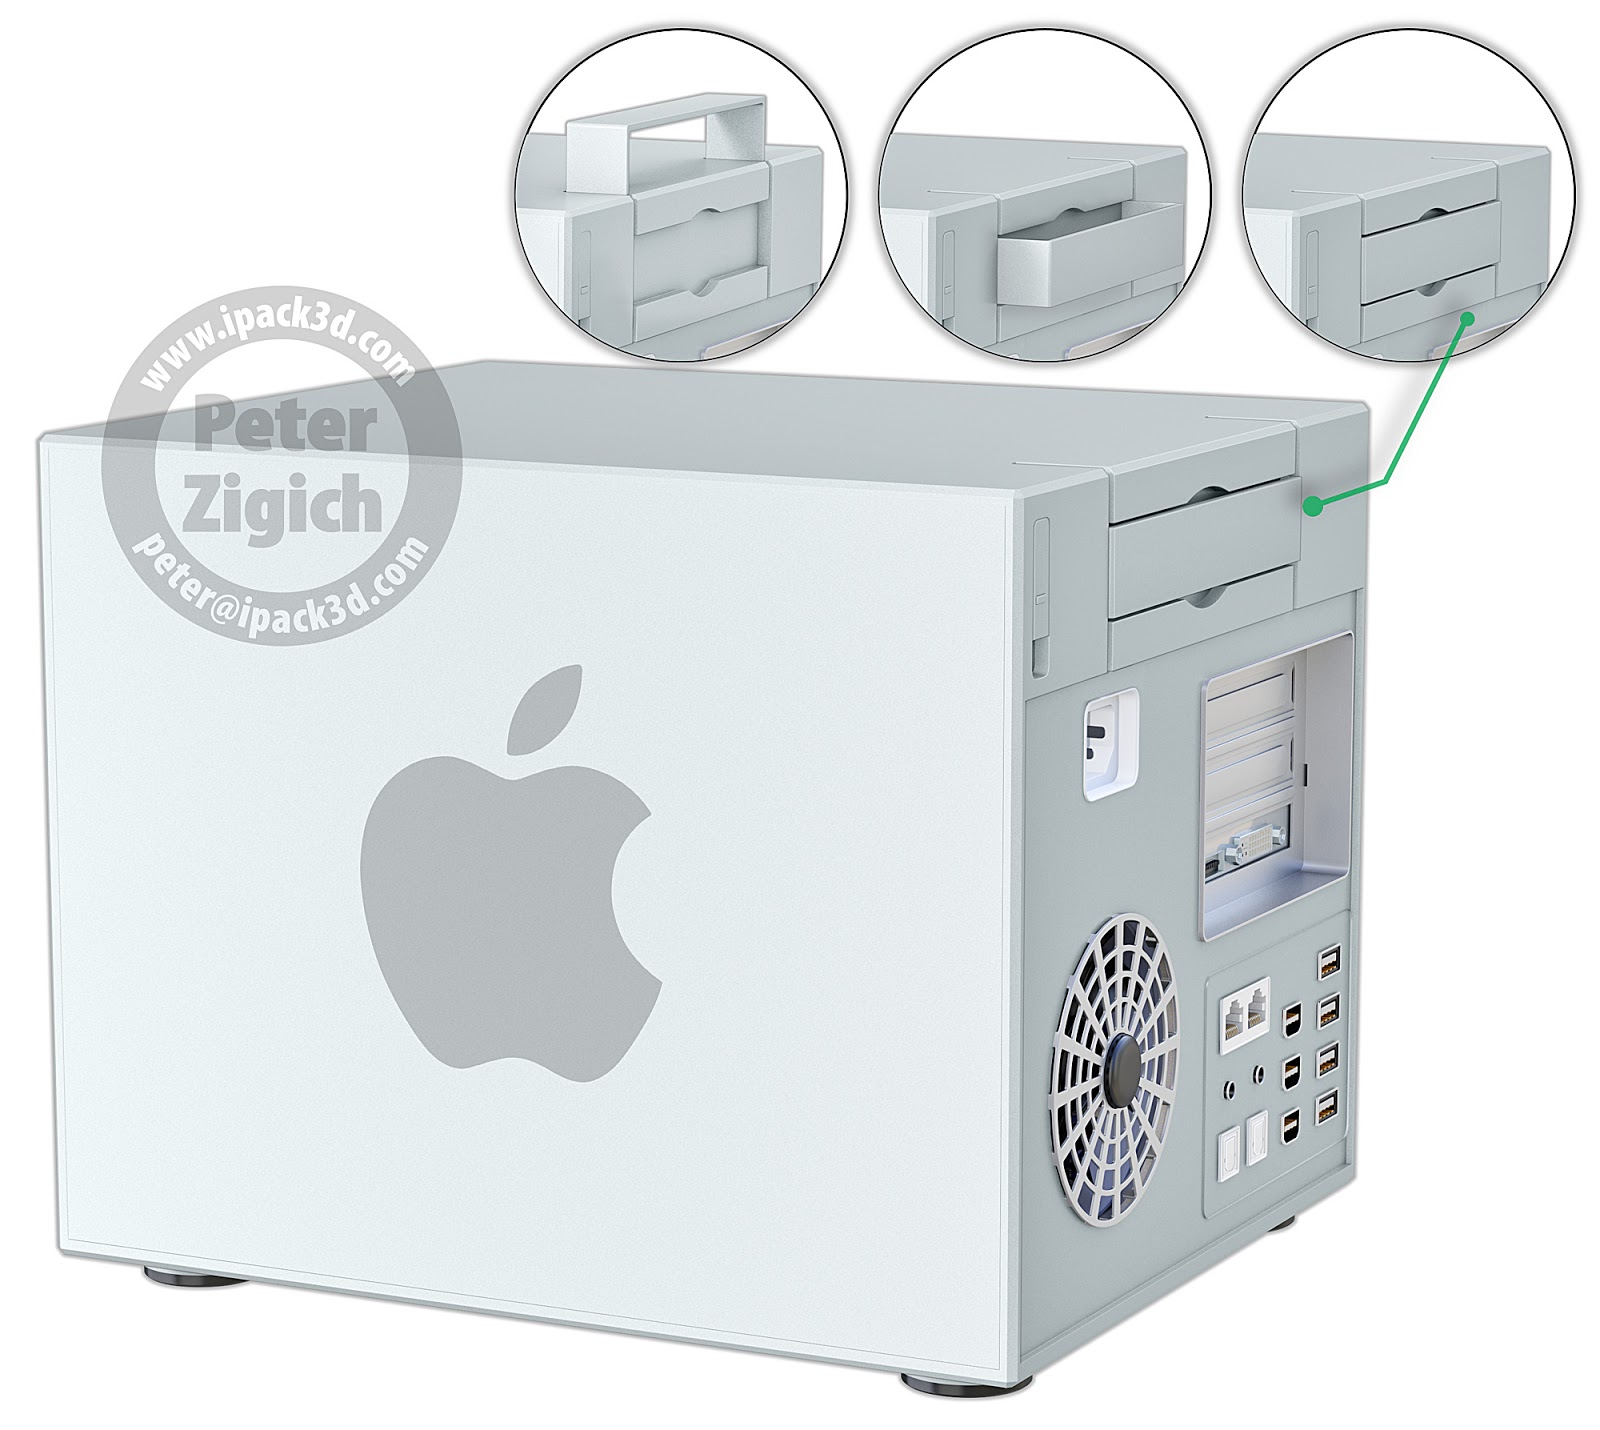 Mac Pro (Peter Zigich concept 001)